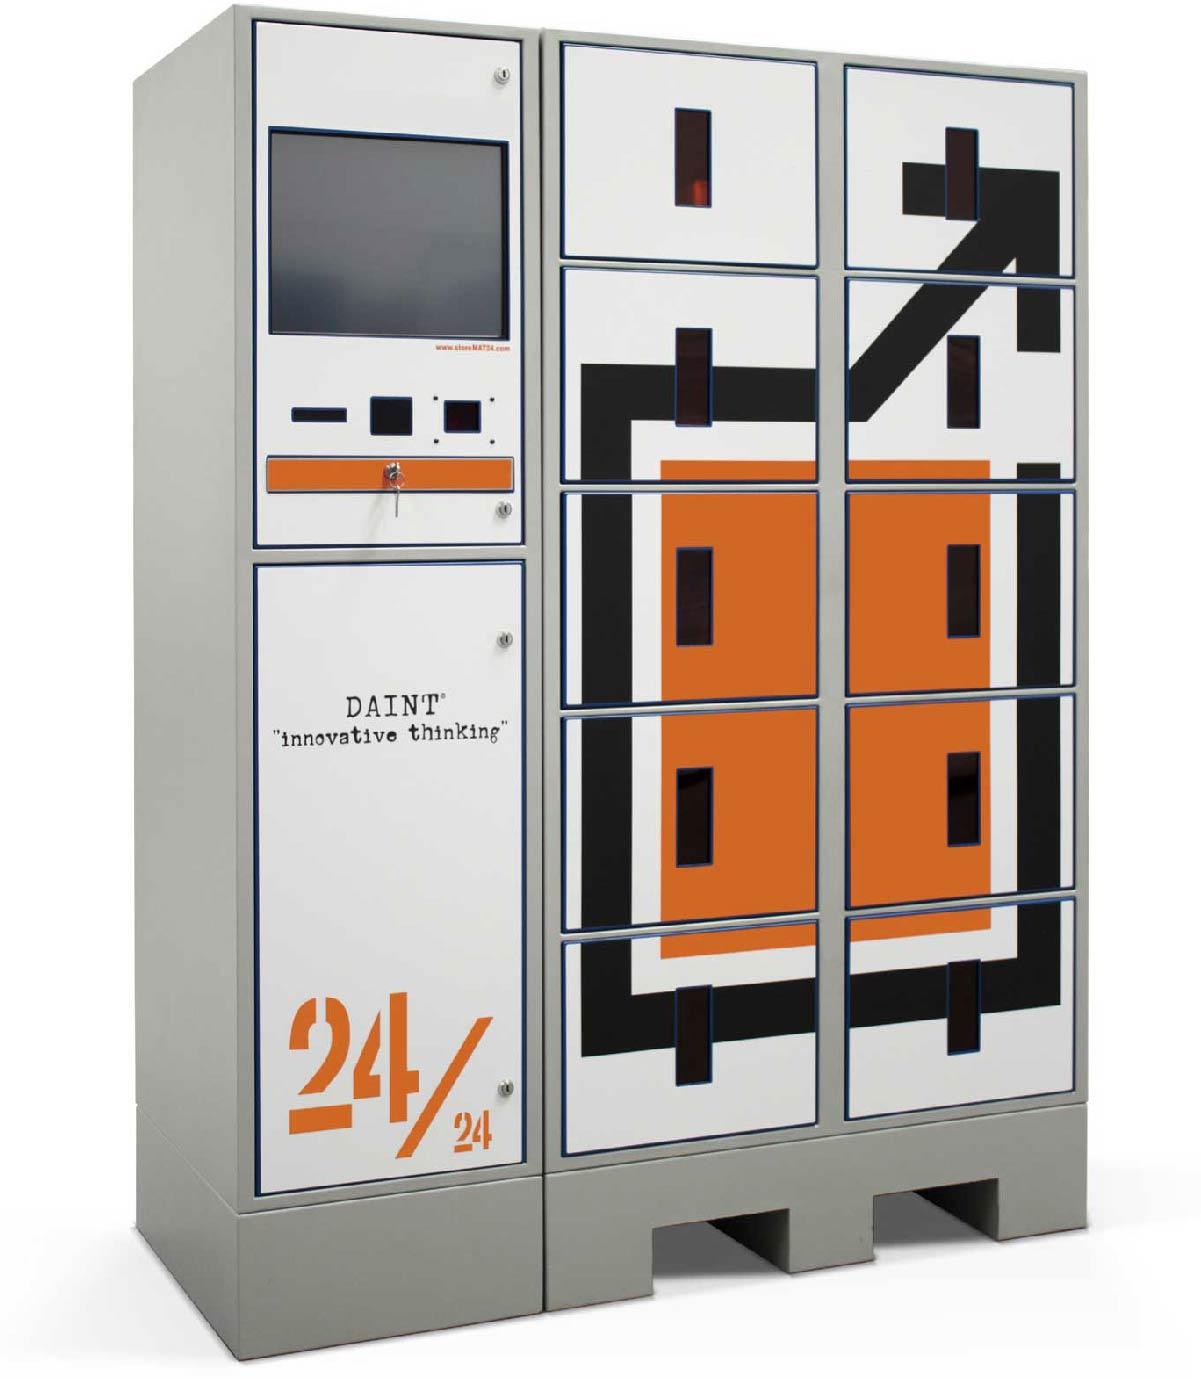 STOREMAT24 - Daint srl Distributori Automatici